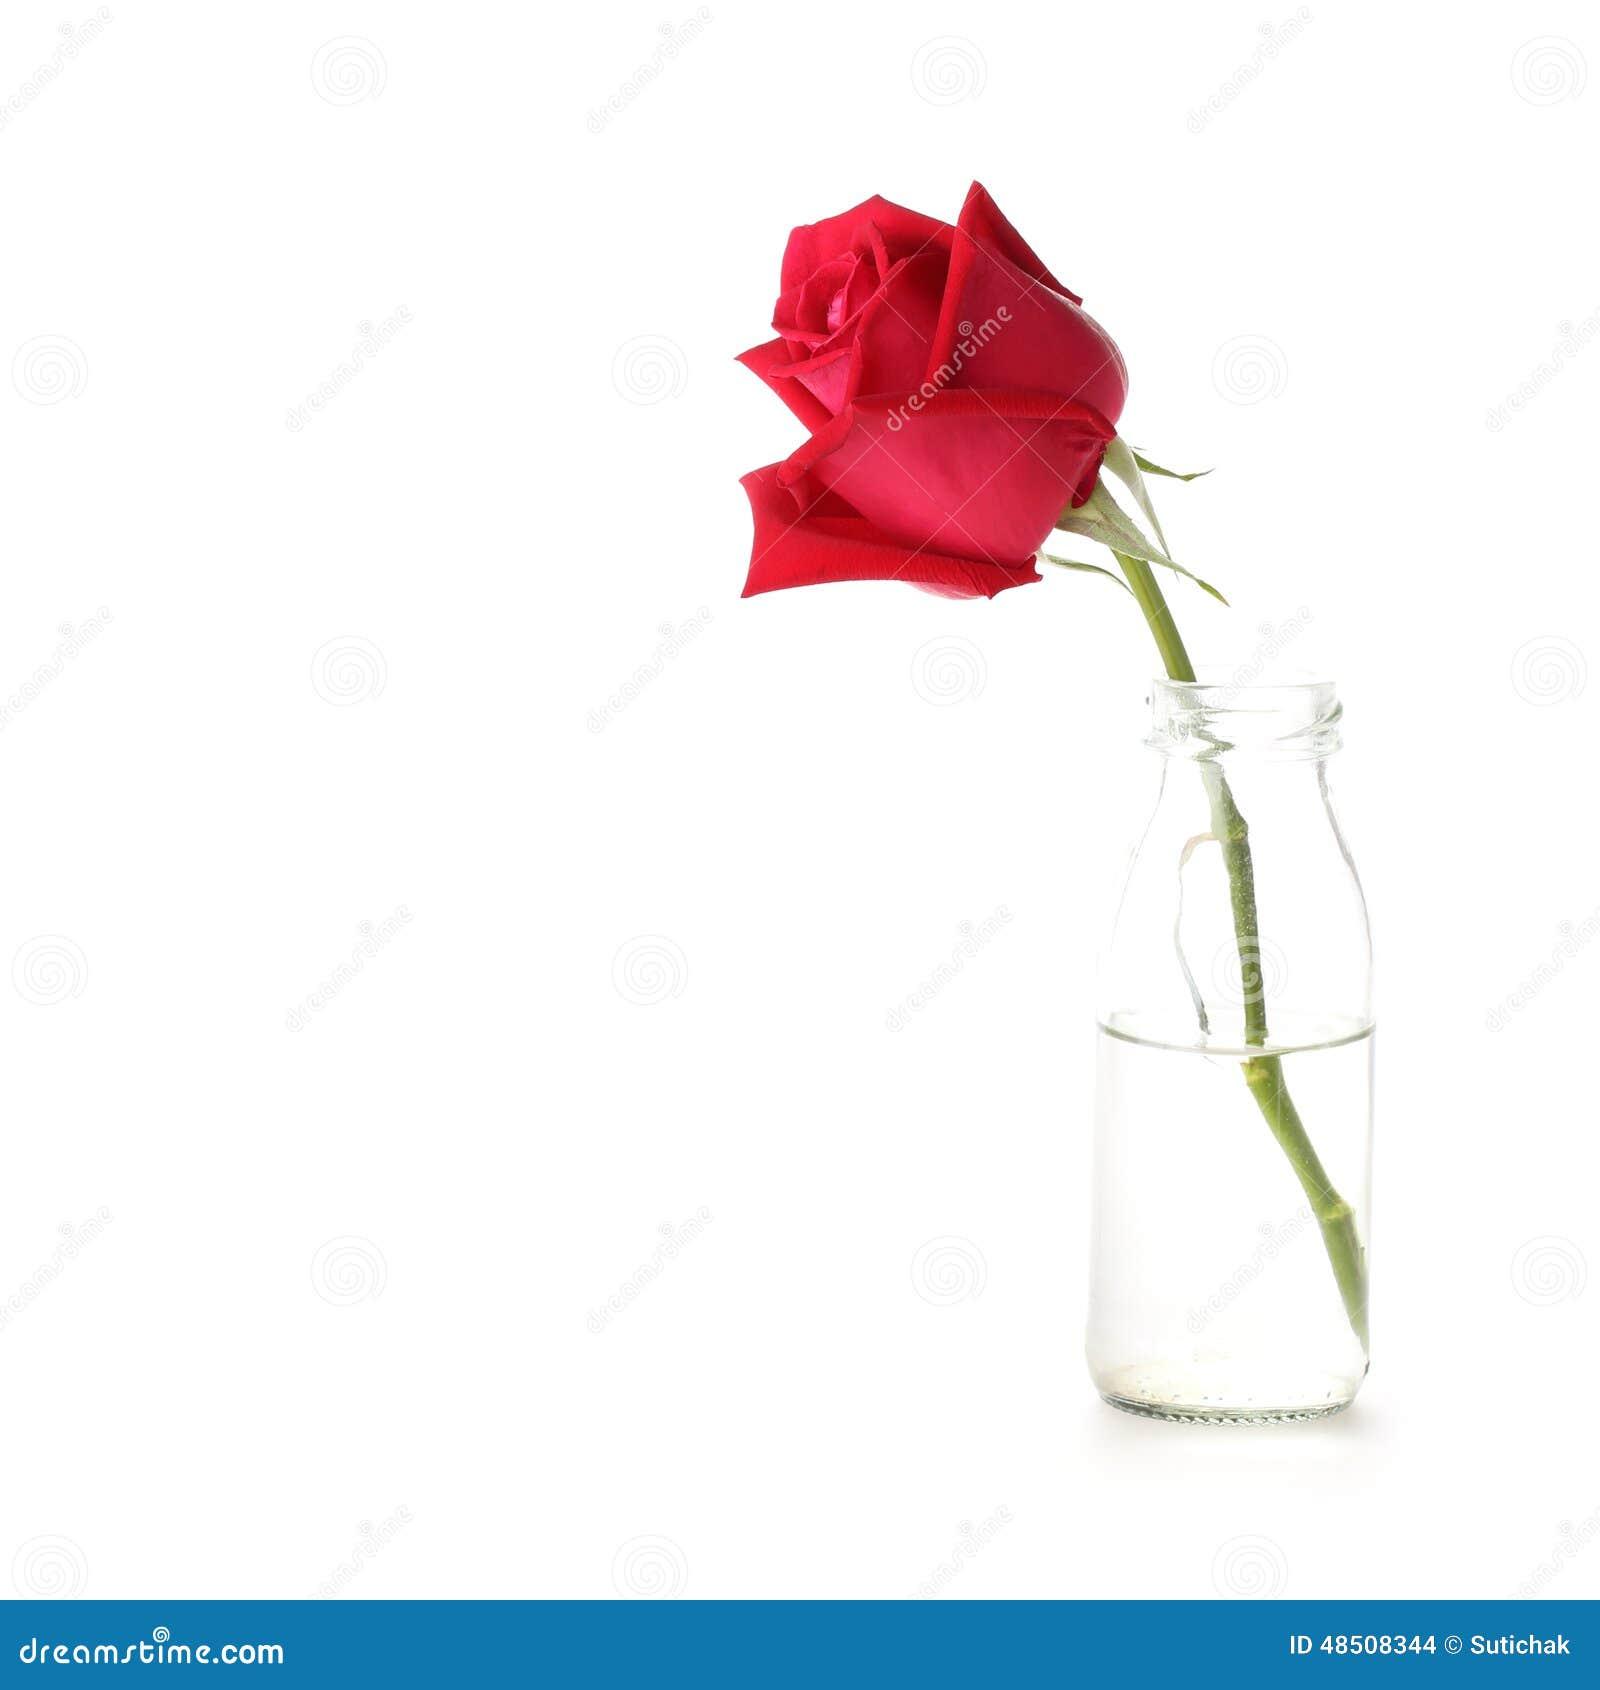 Red Rose Flower In Glass Vase Stock Photo Image Of Bottle Love 48508344